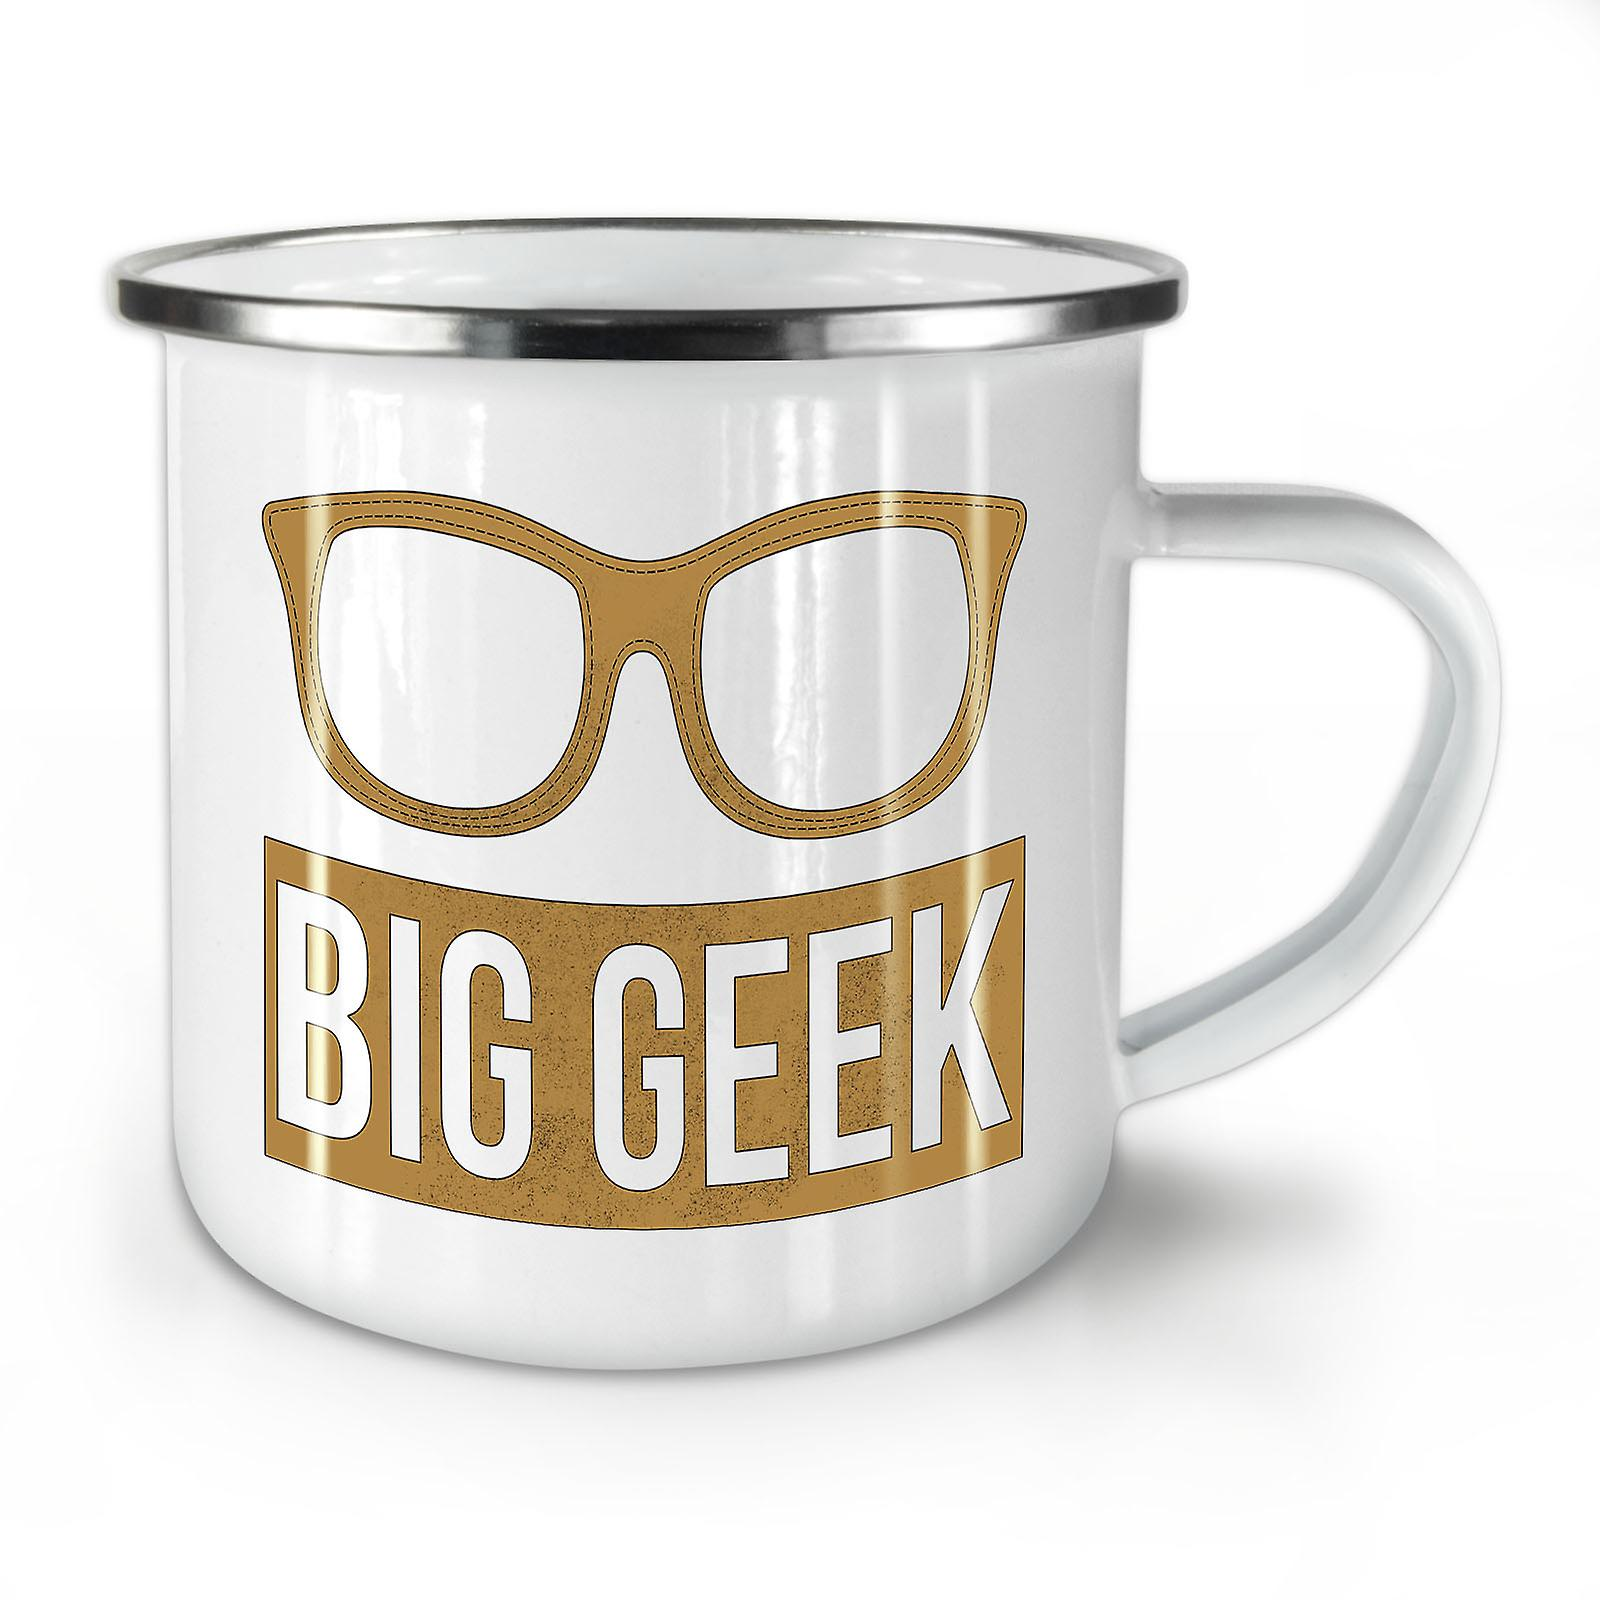 Whitetea Glasses Mug10 Geek OzWellcoda Coffee New Big Enamel lucF1KJ3T